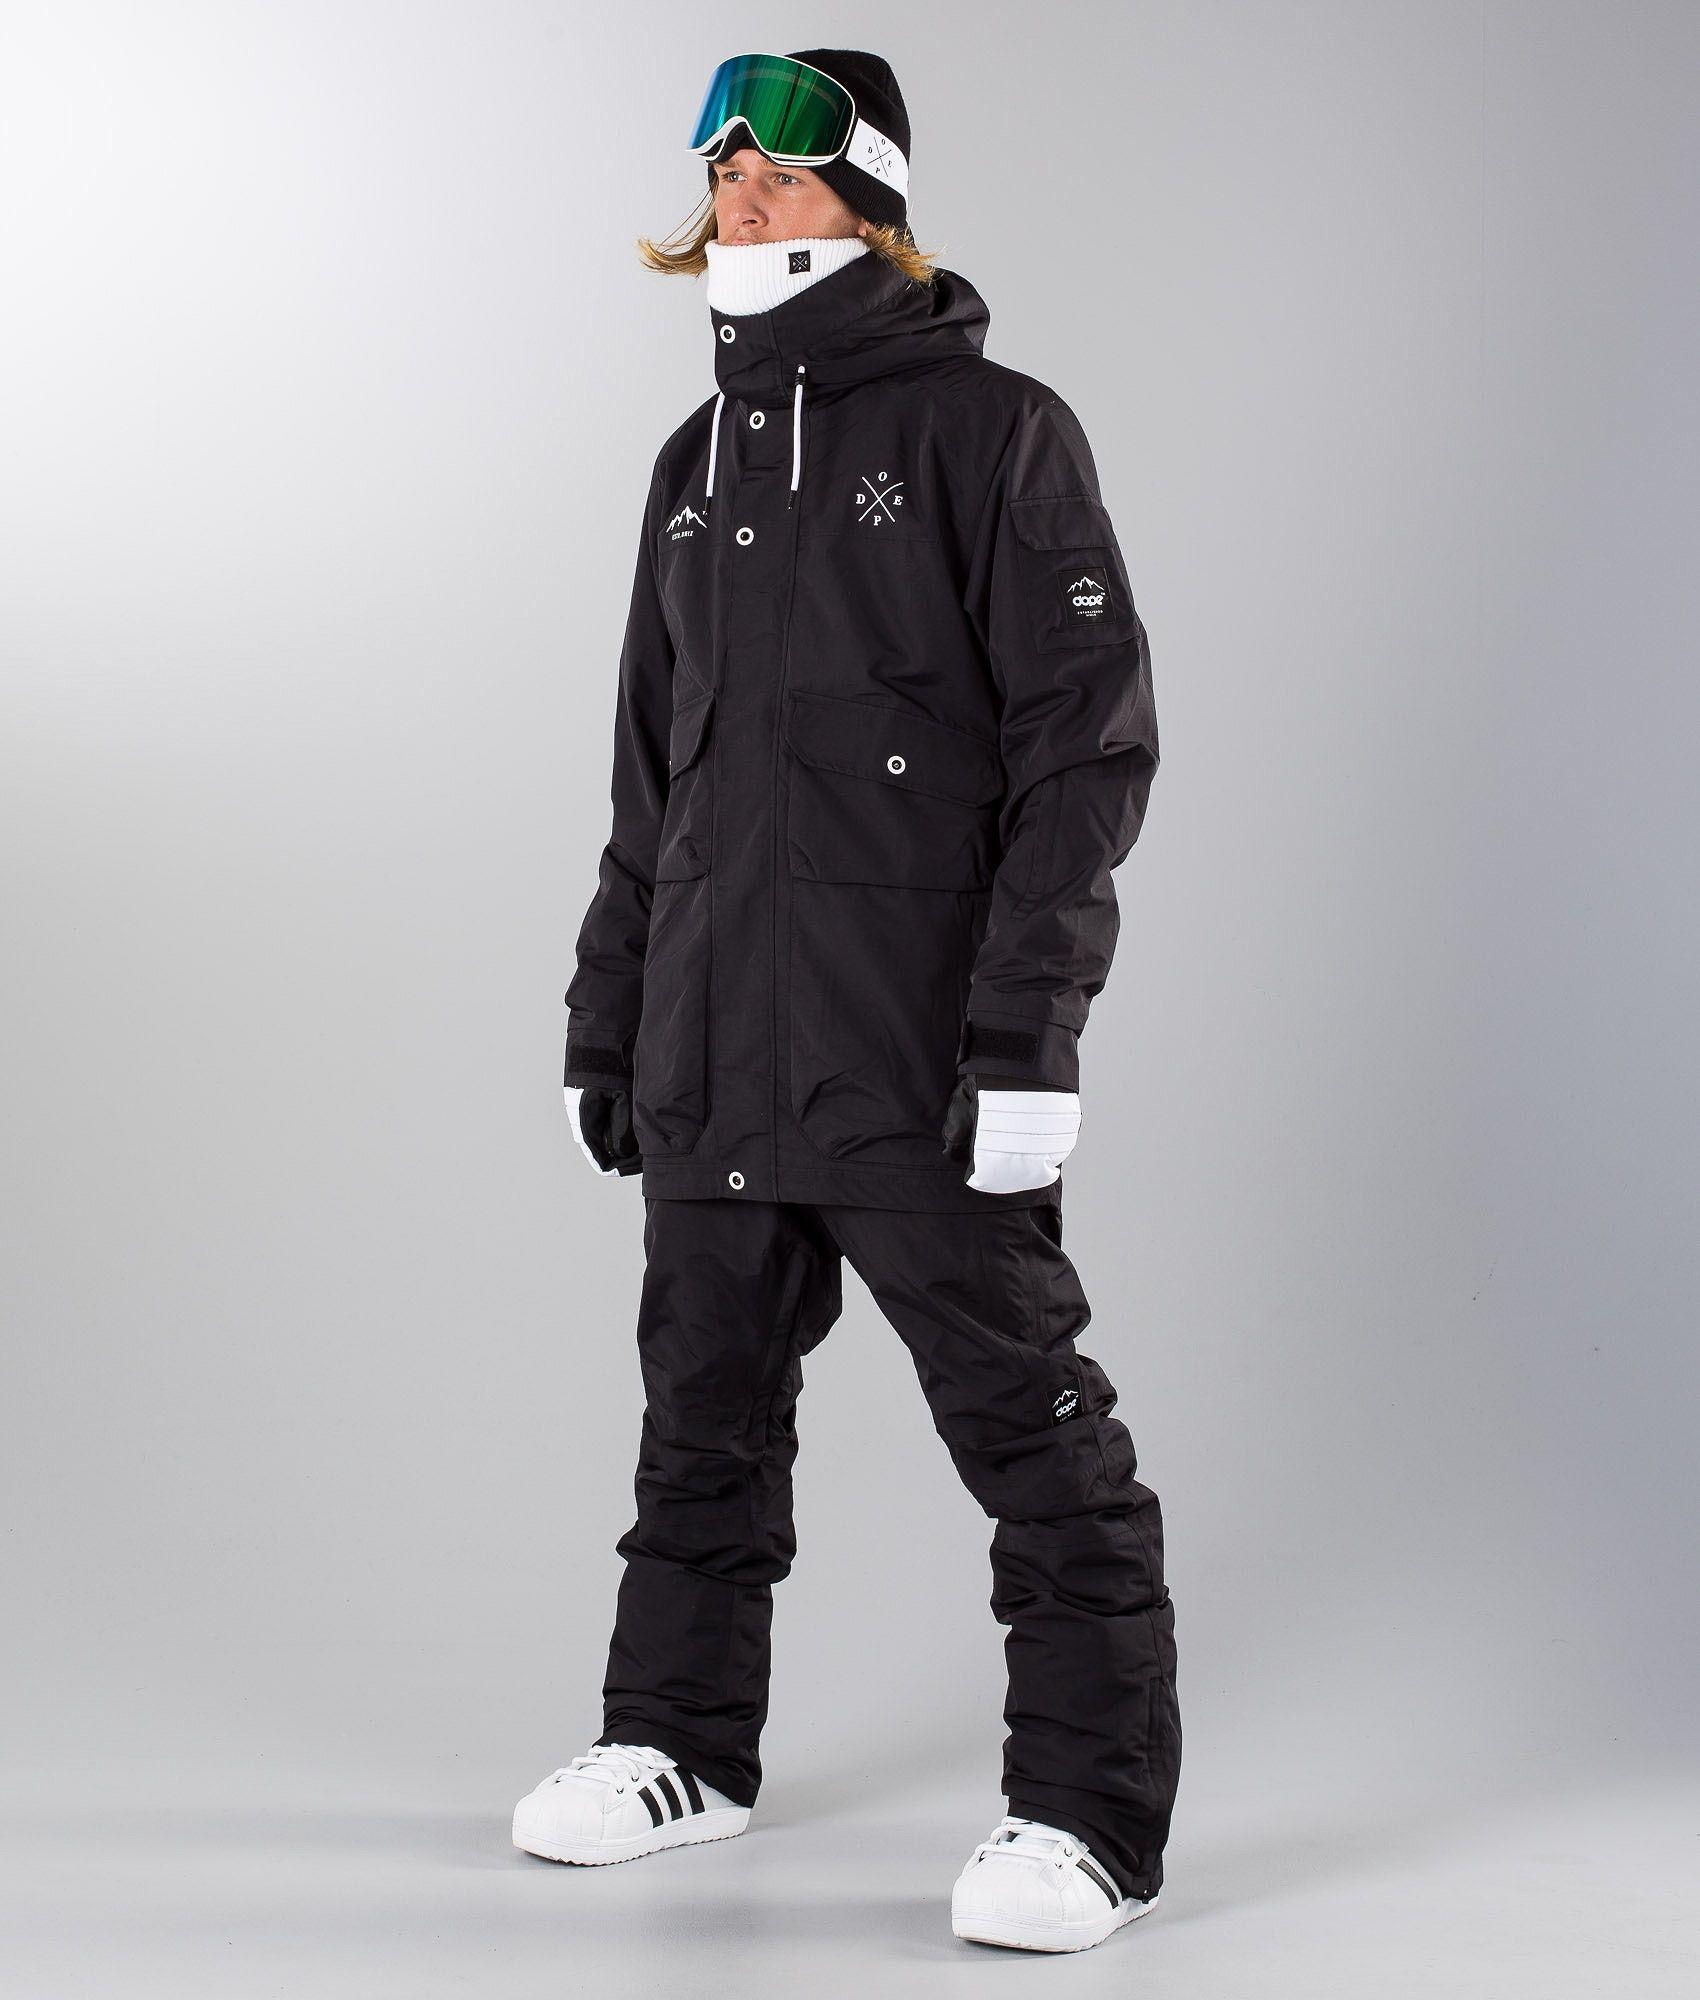 bed1aae27cb Dope Hoax II Snowboard Jacket Black | Snowboard Gear | Snowboard ...